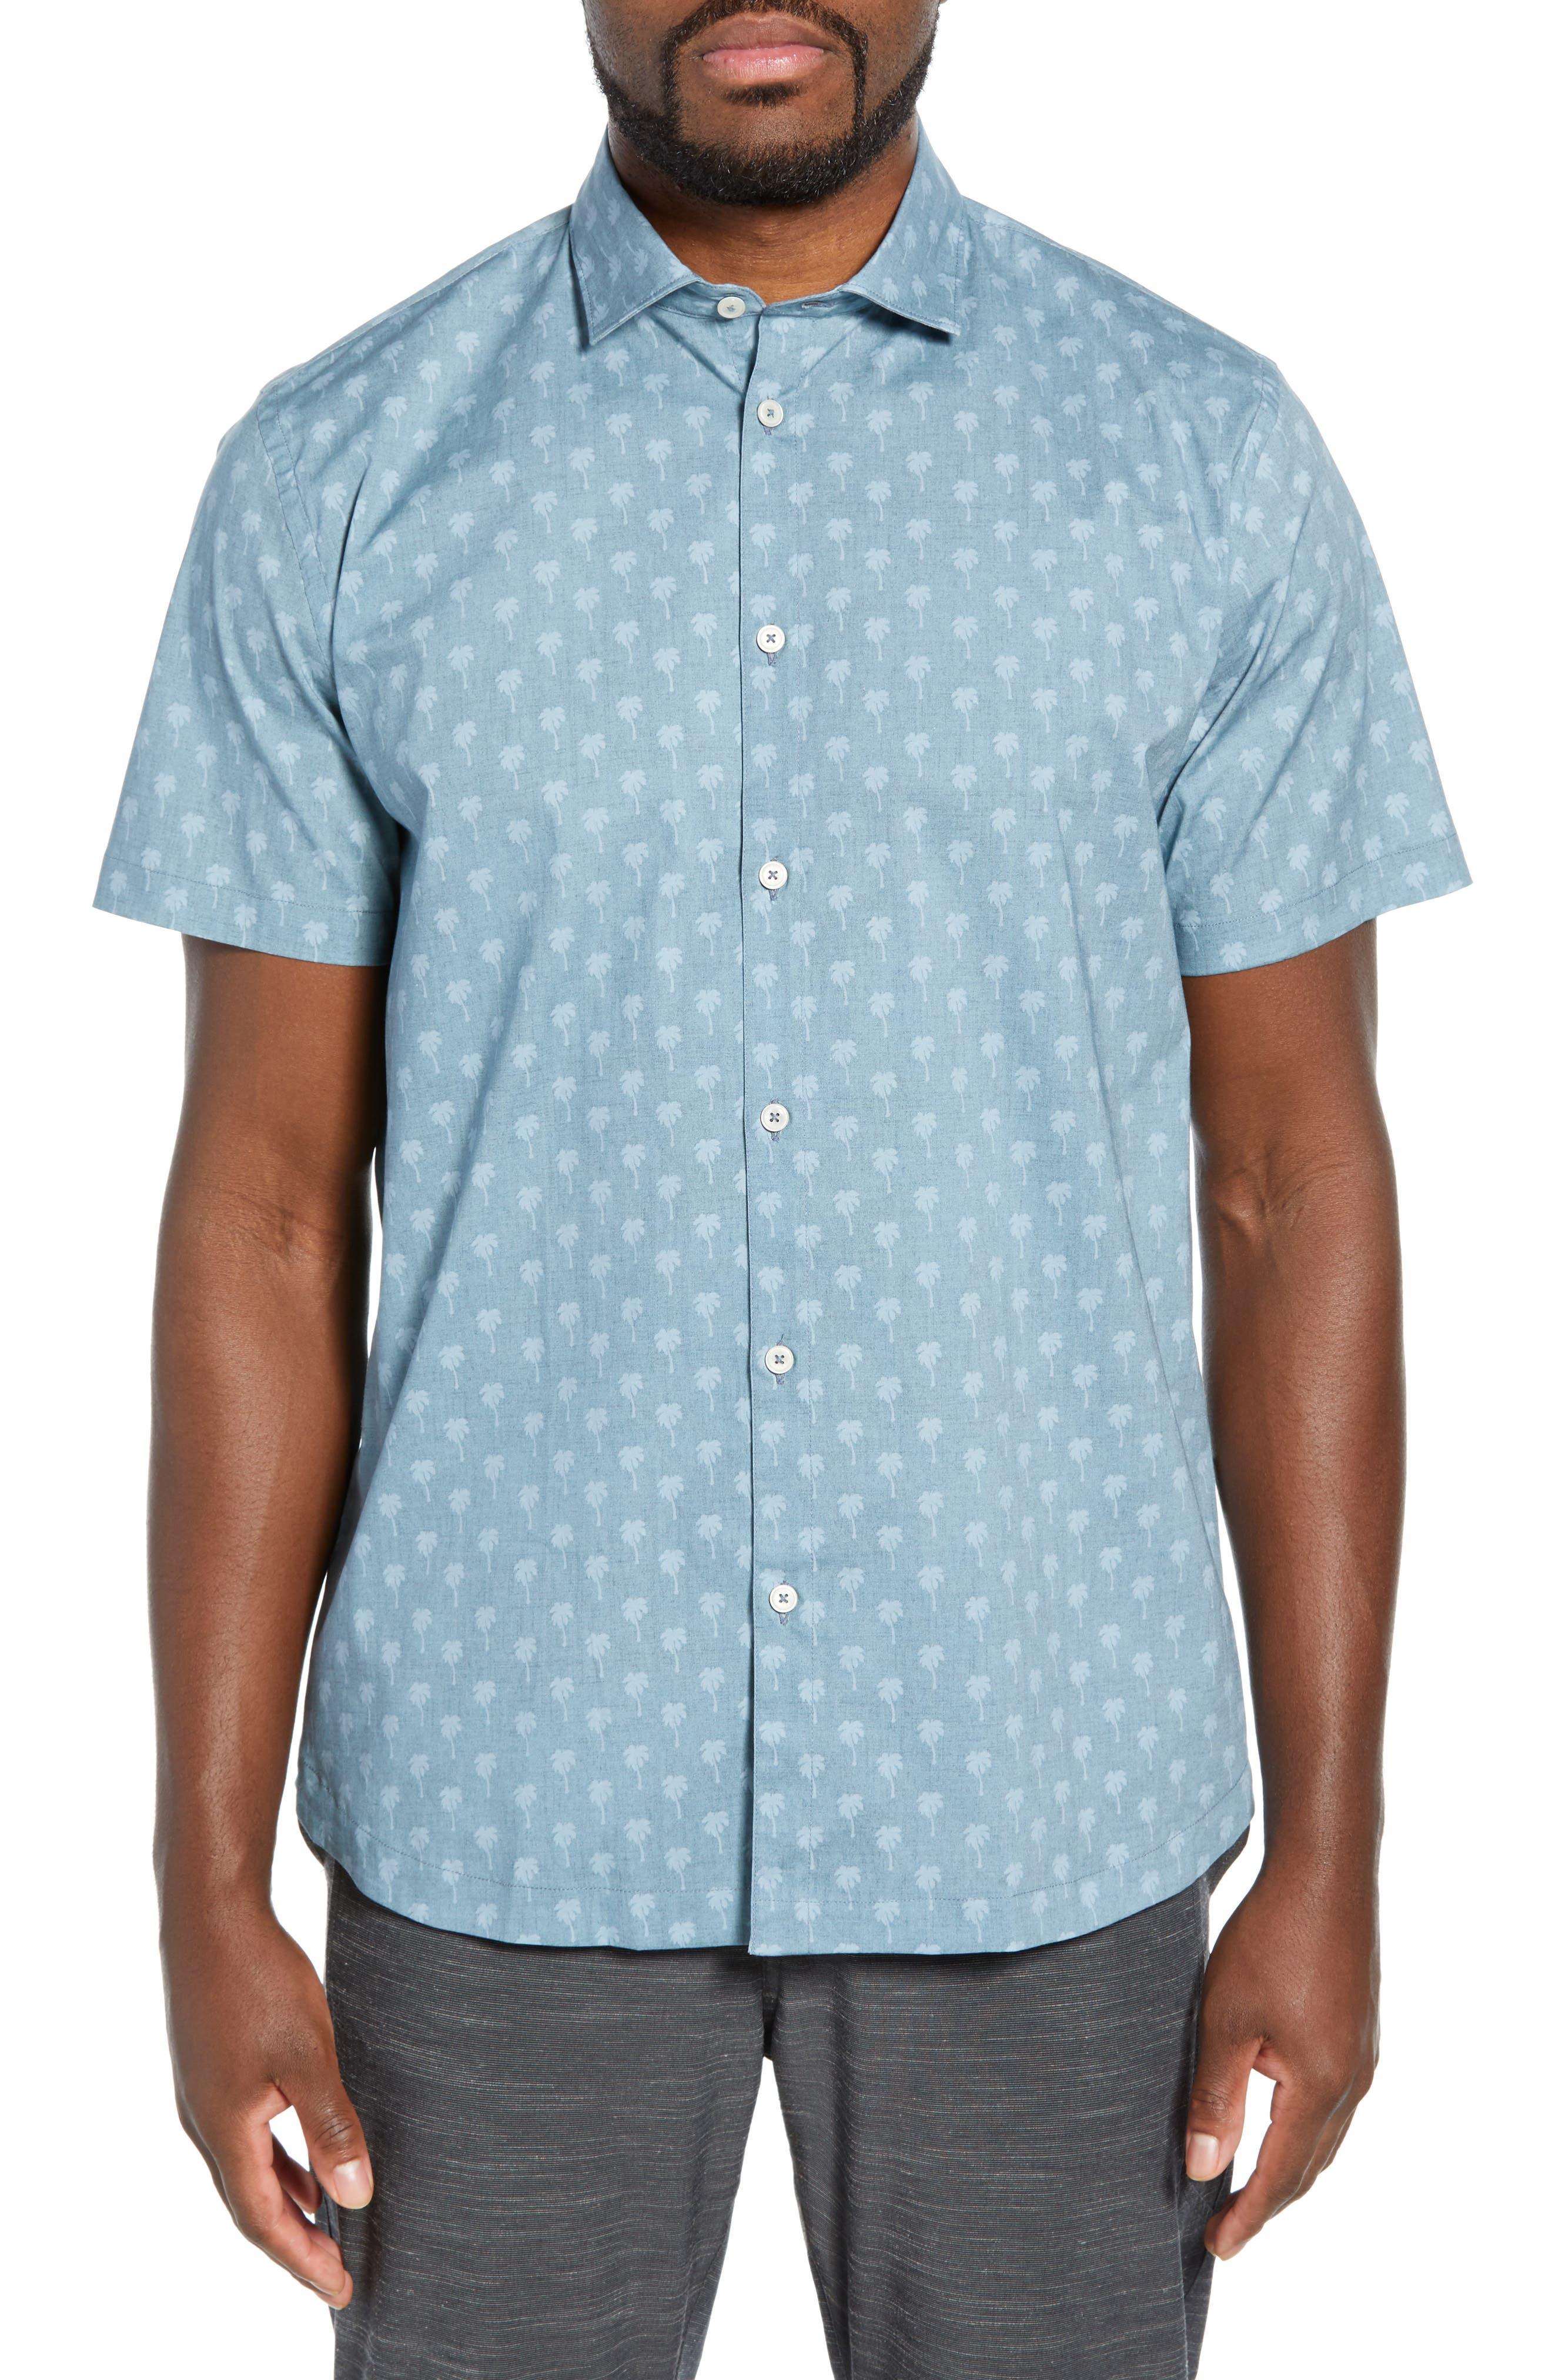 DEVEREUX Cabana Regular Fit Sport Shirt, Main, color, PALMS